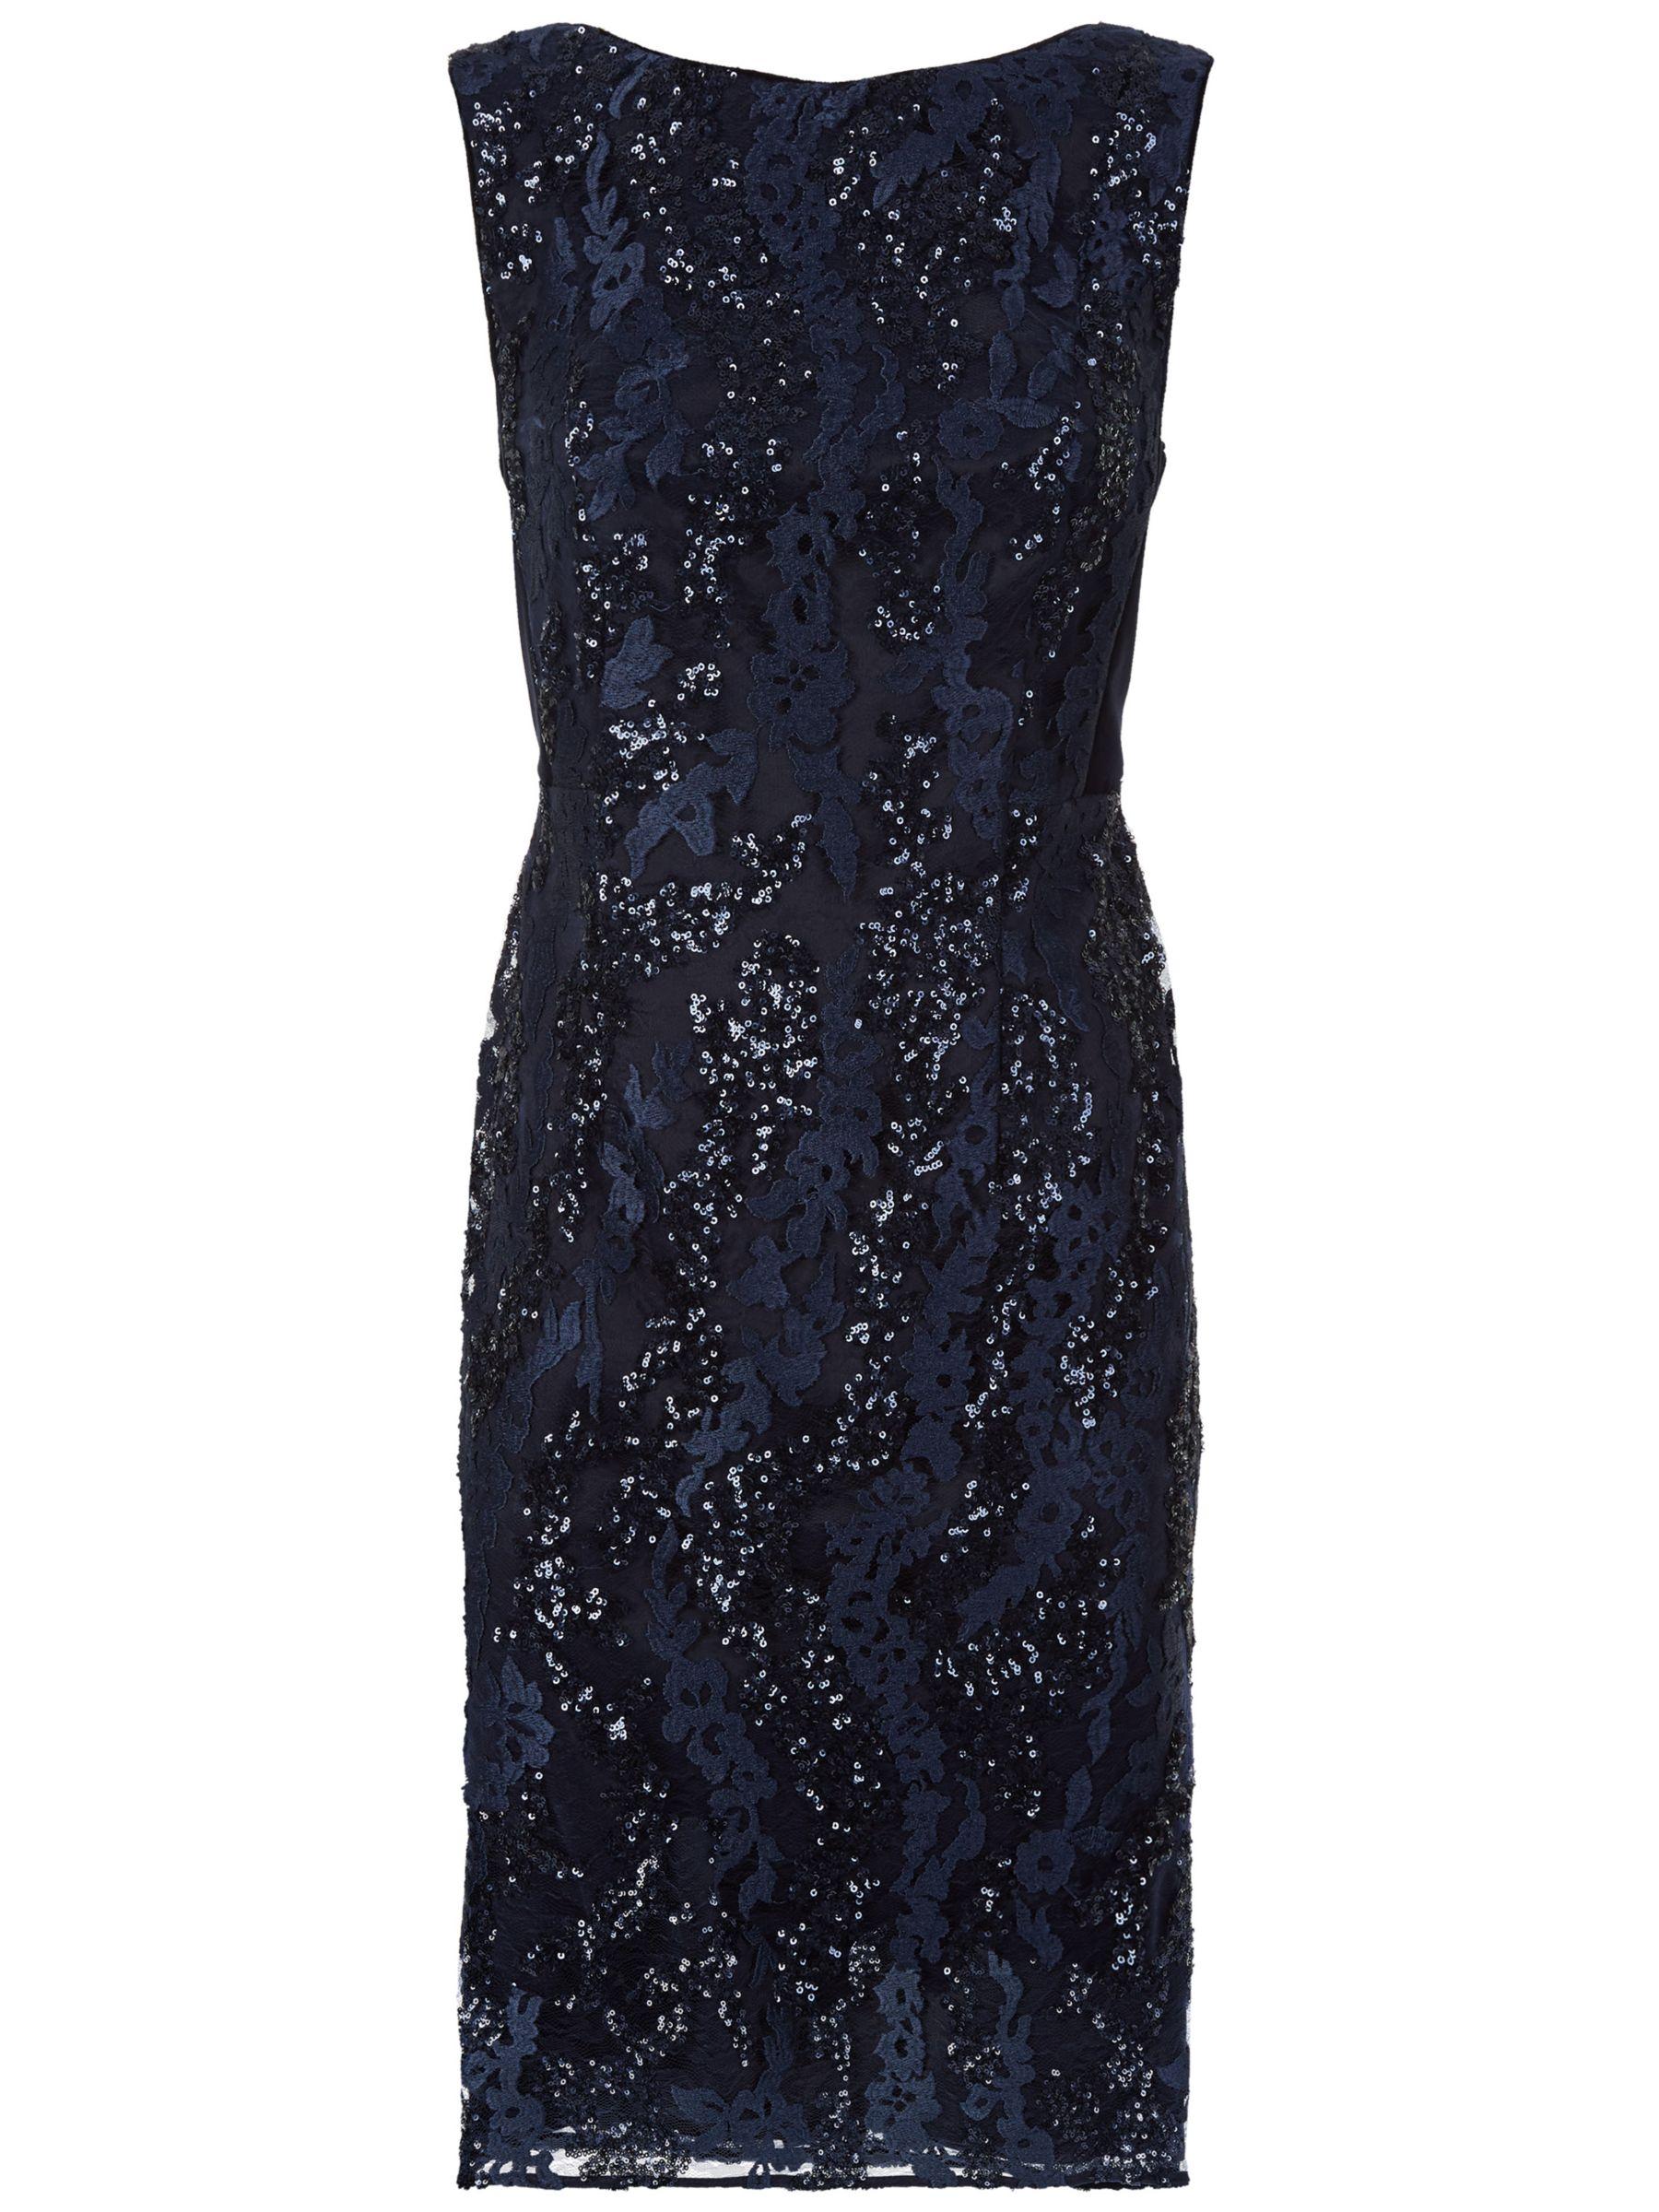 c455a4fdd76 Fenn Wright Manson Zara Sequin Dress